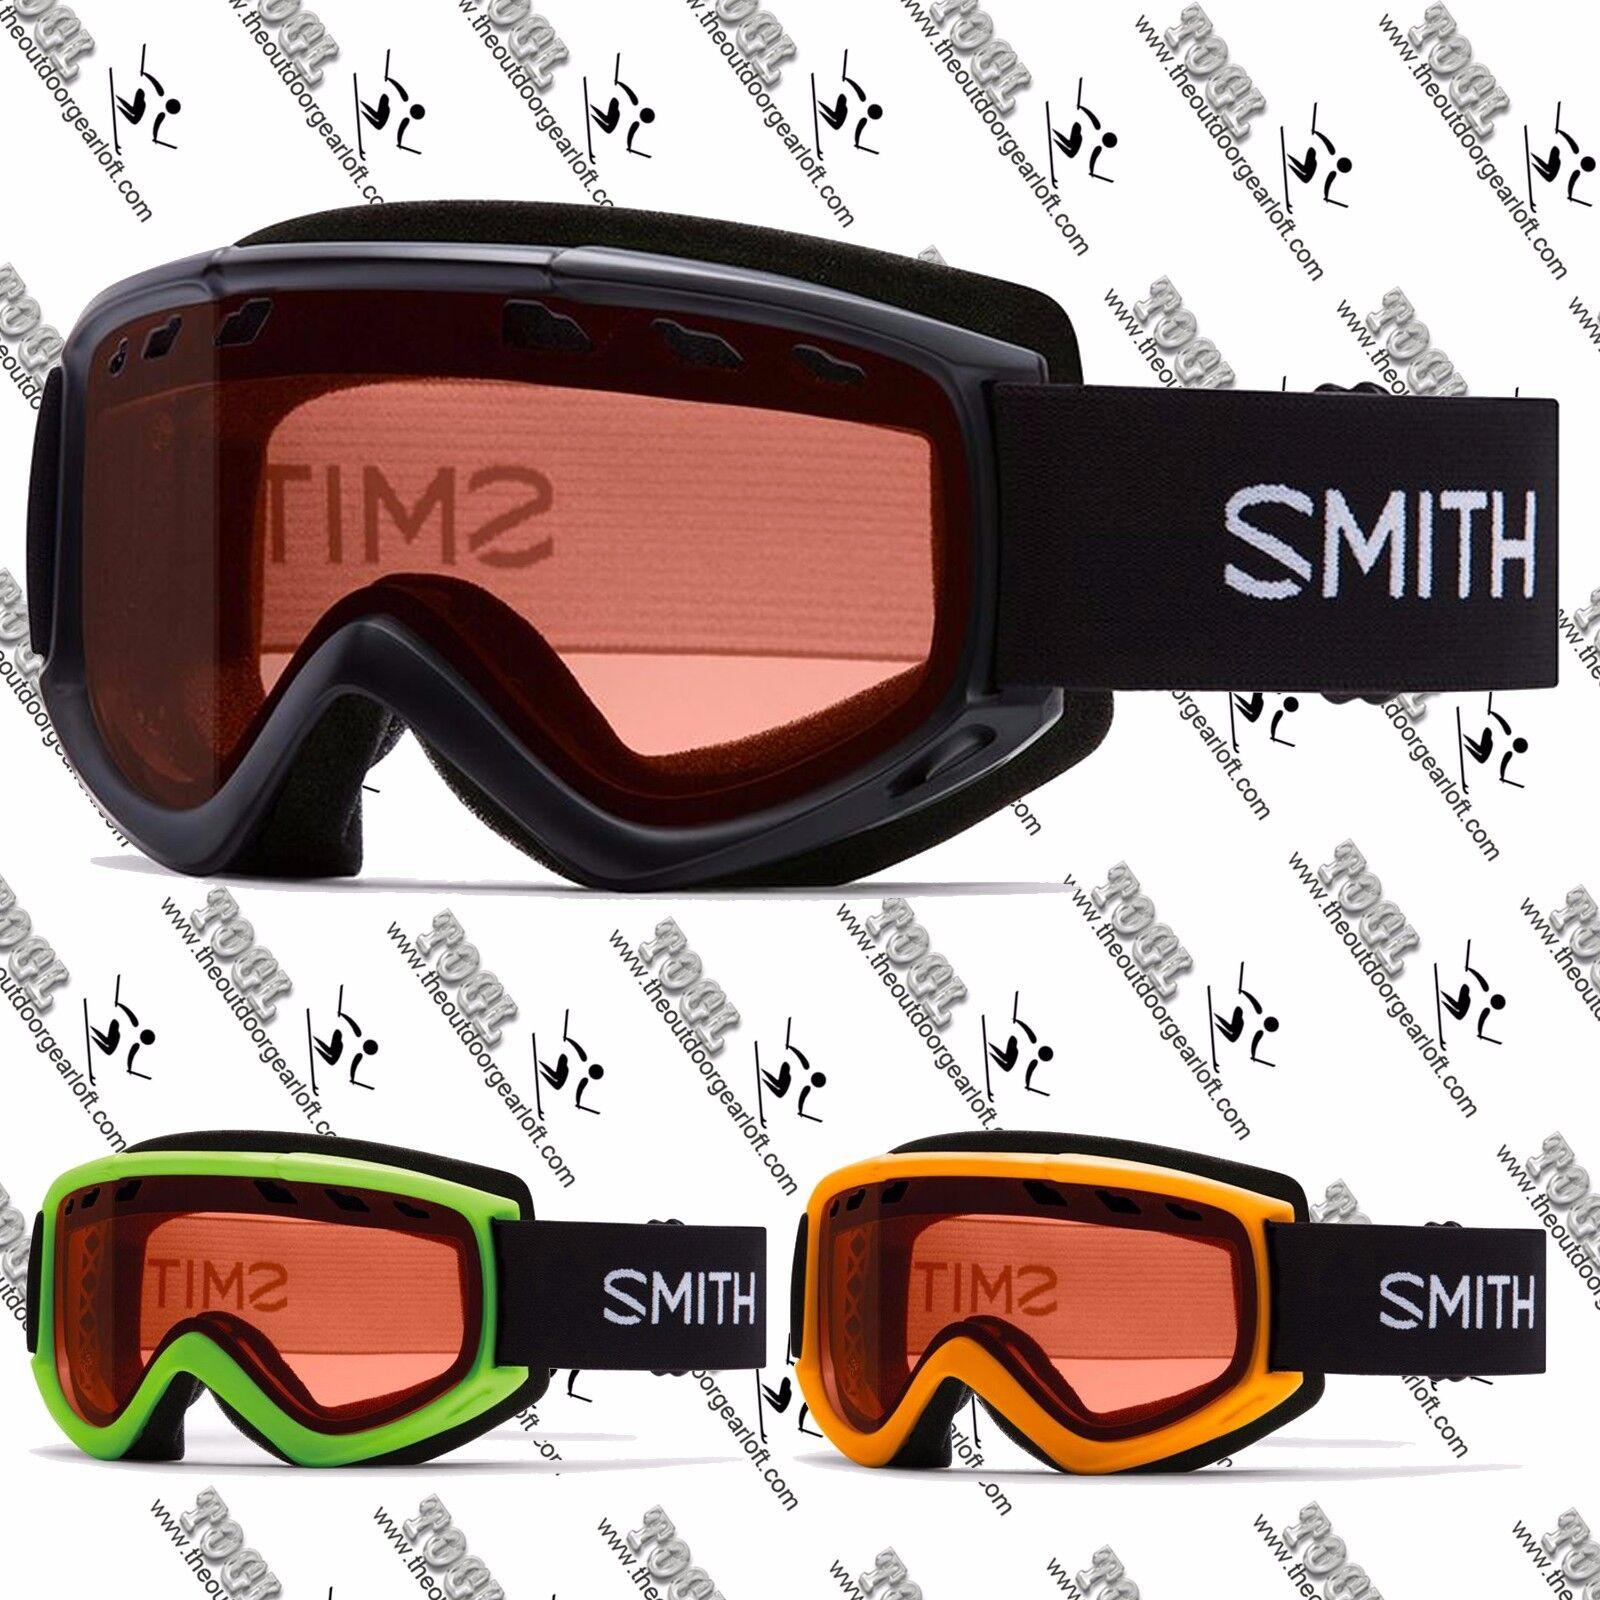 SMITH OPTICS MEN'S WOMEN'S UNISEX CASCADE SKI SNOW SNOWMOBILE SNOWBOARD GOGGLE